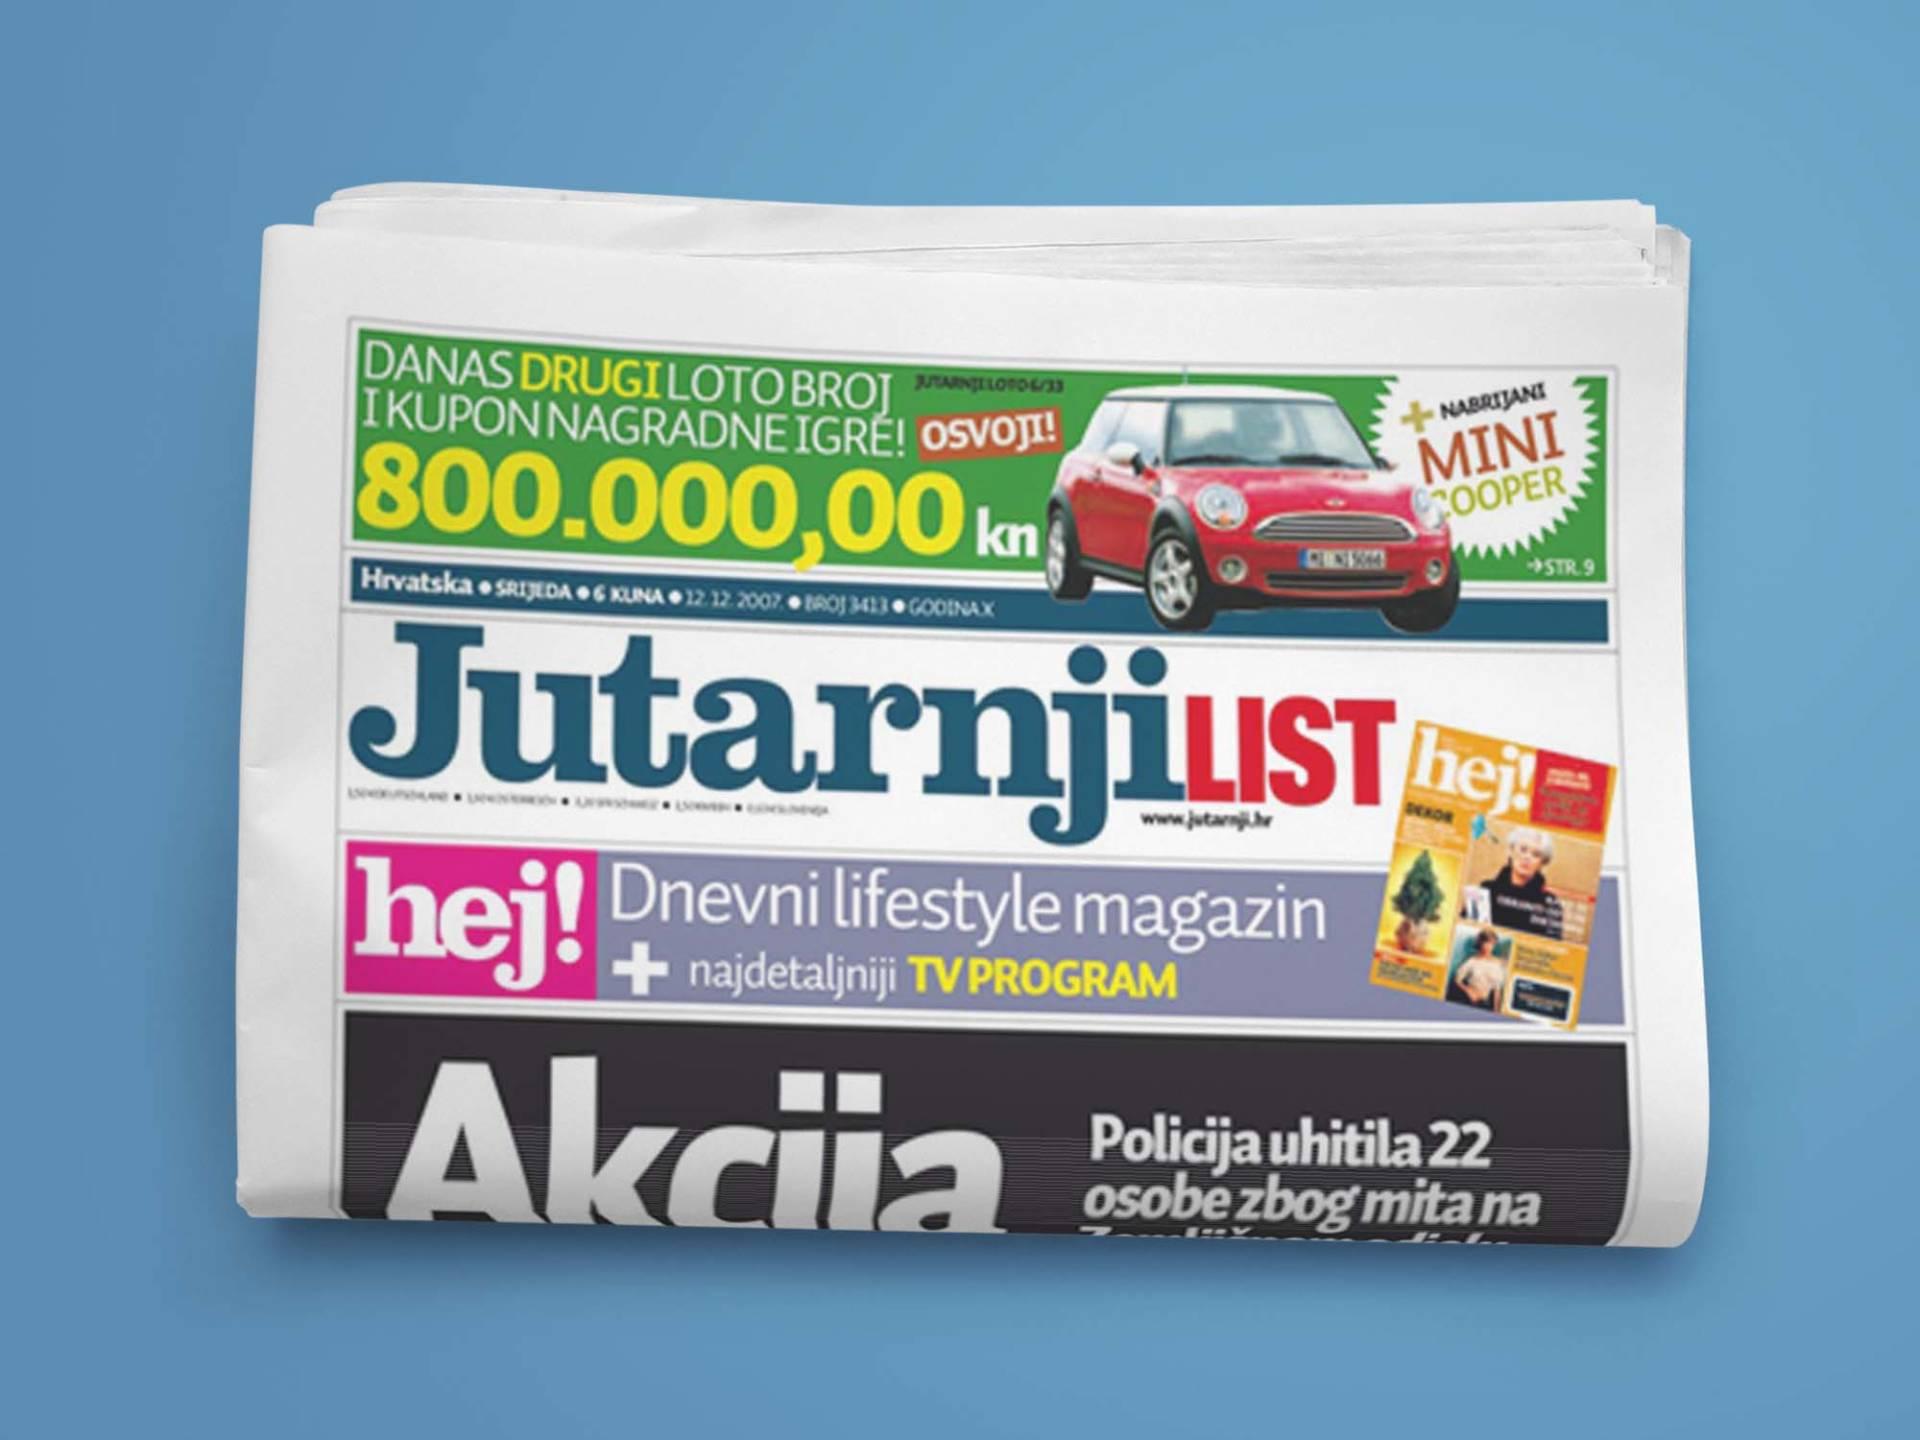 Jutarnji_List_01_Wenceslau_News_Design